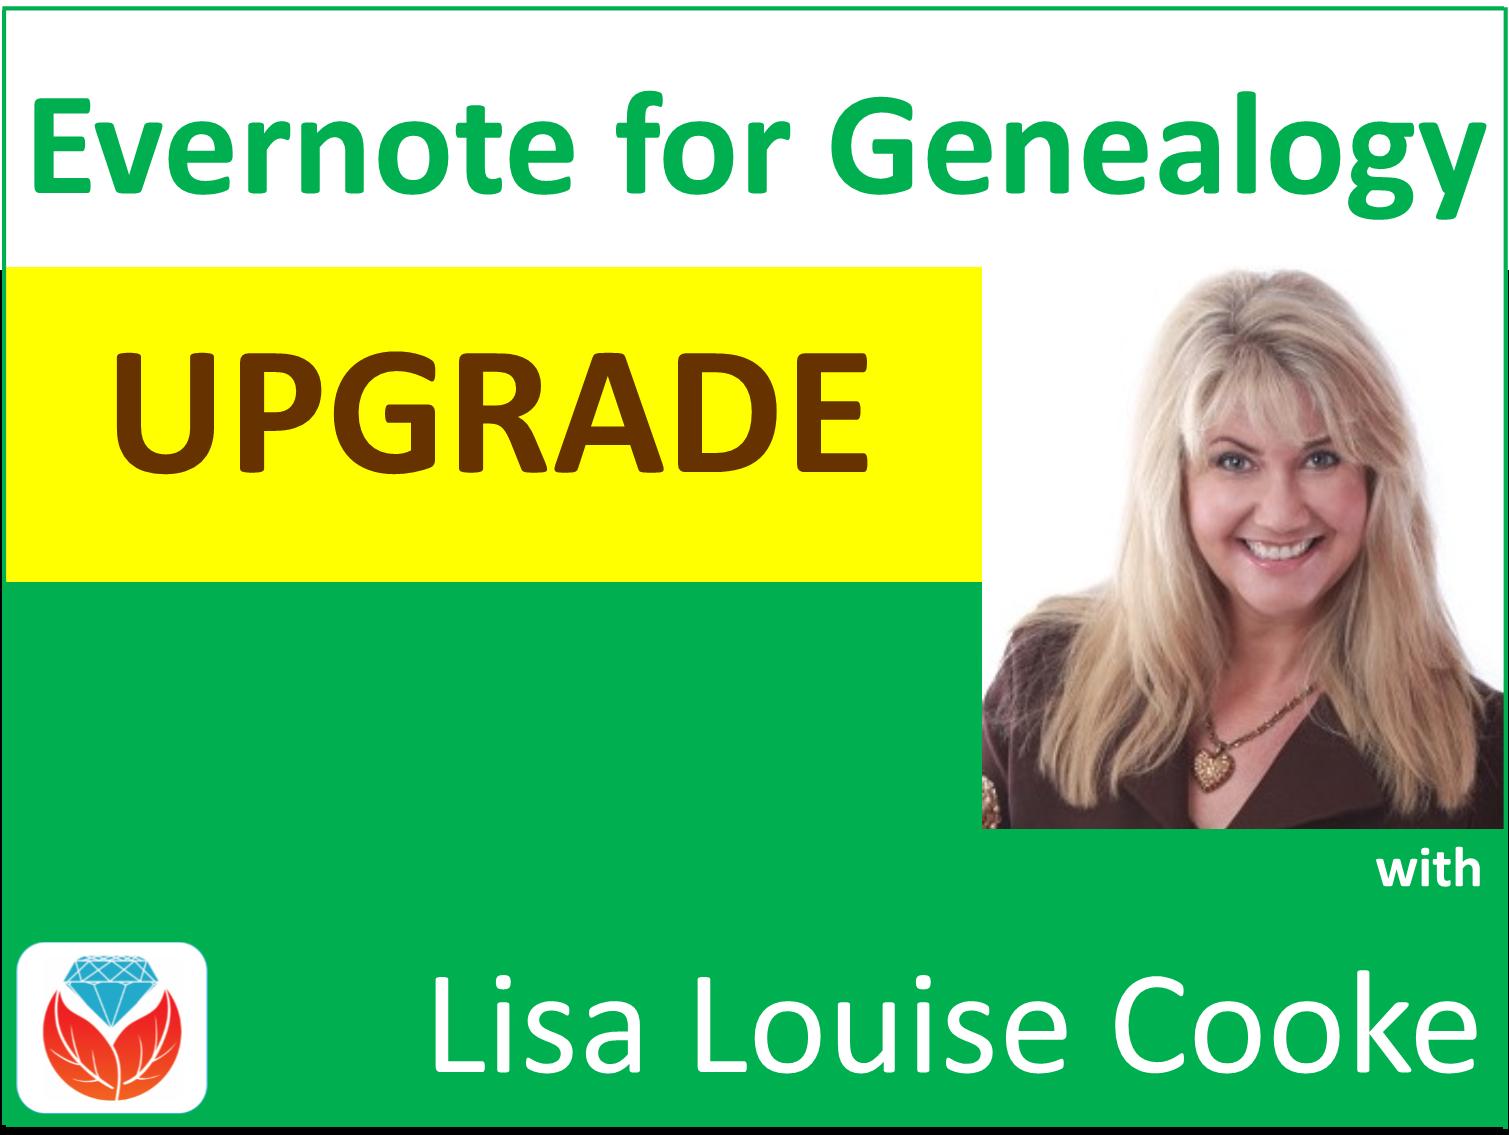 Evernote_Upgrade_Image